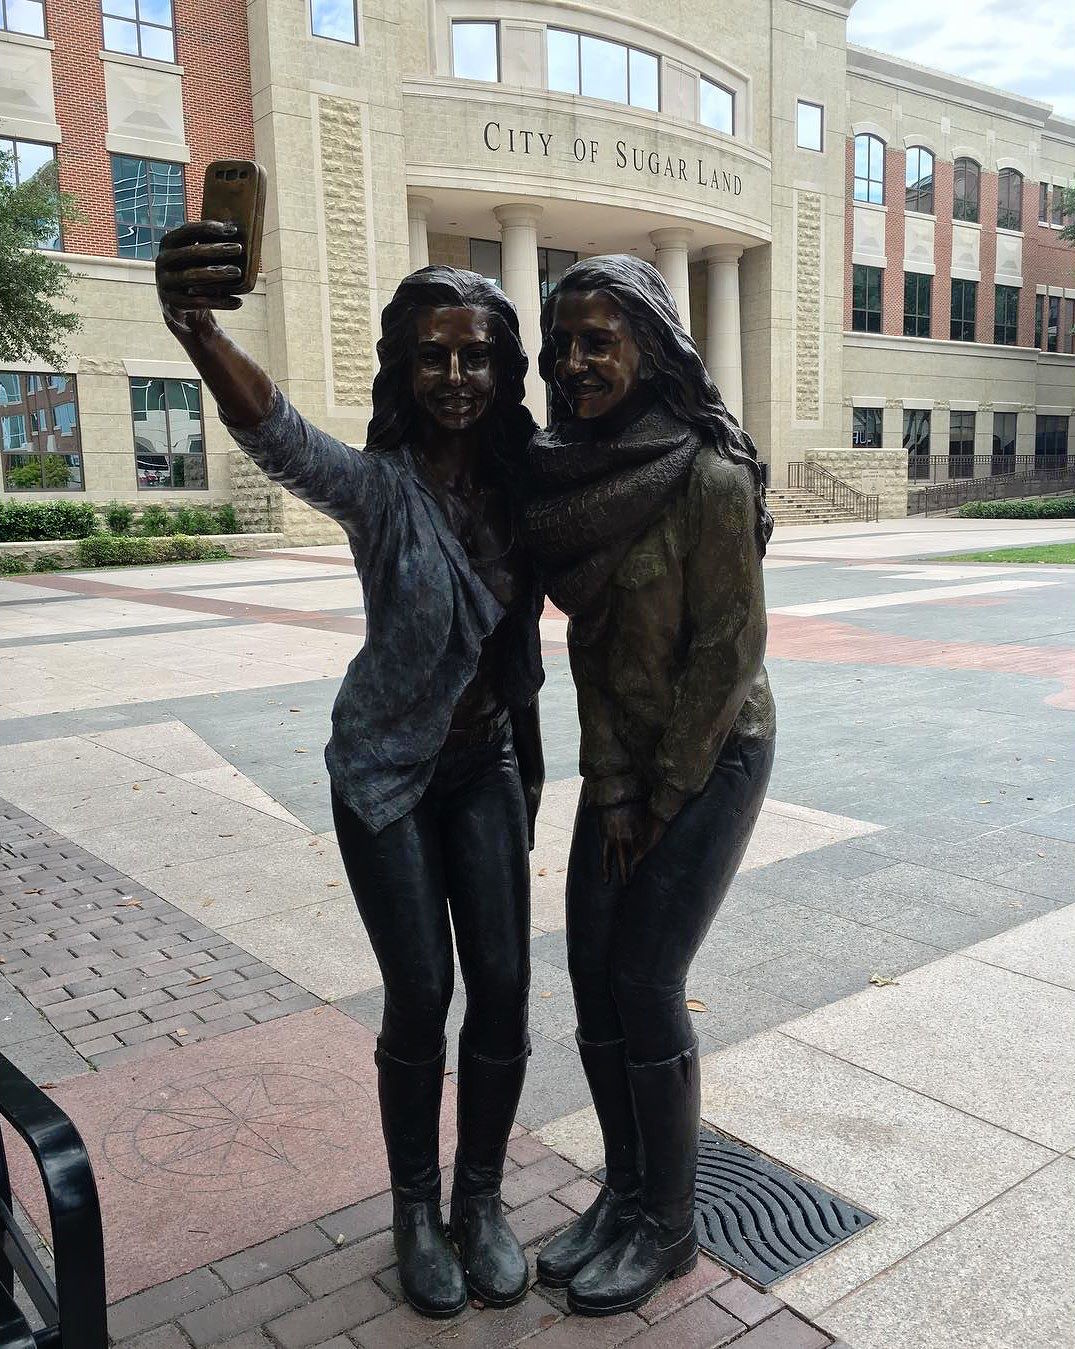 Sugar Land's selfie statue (photo via @hypchk/Instagram)